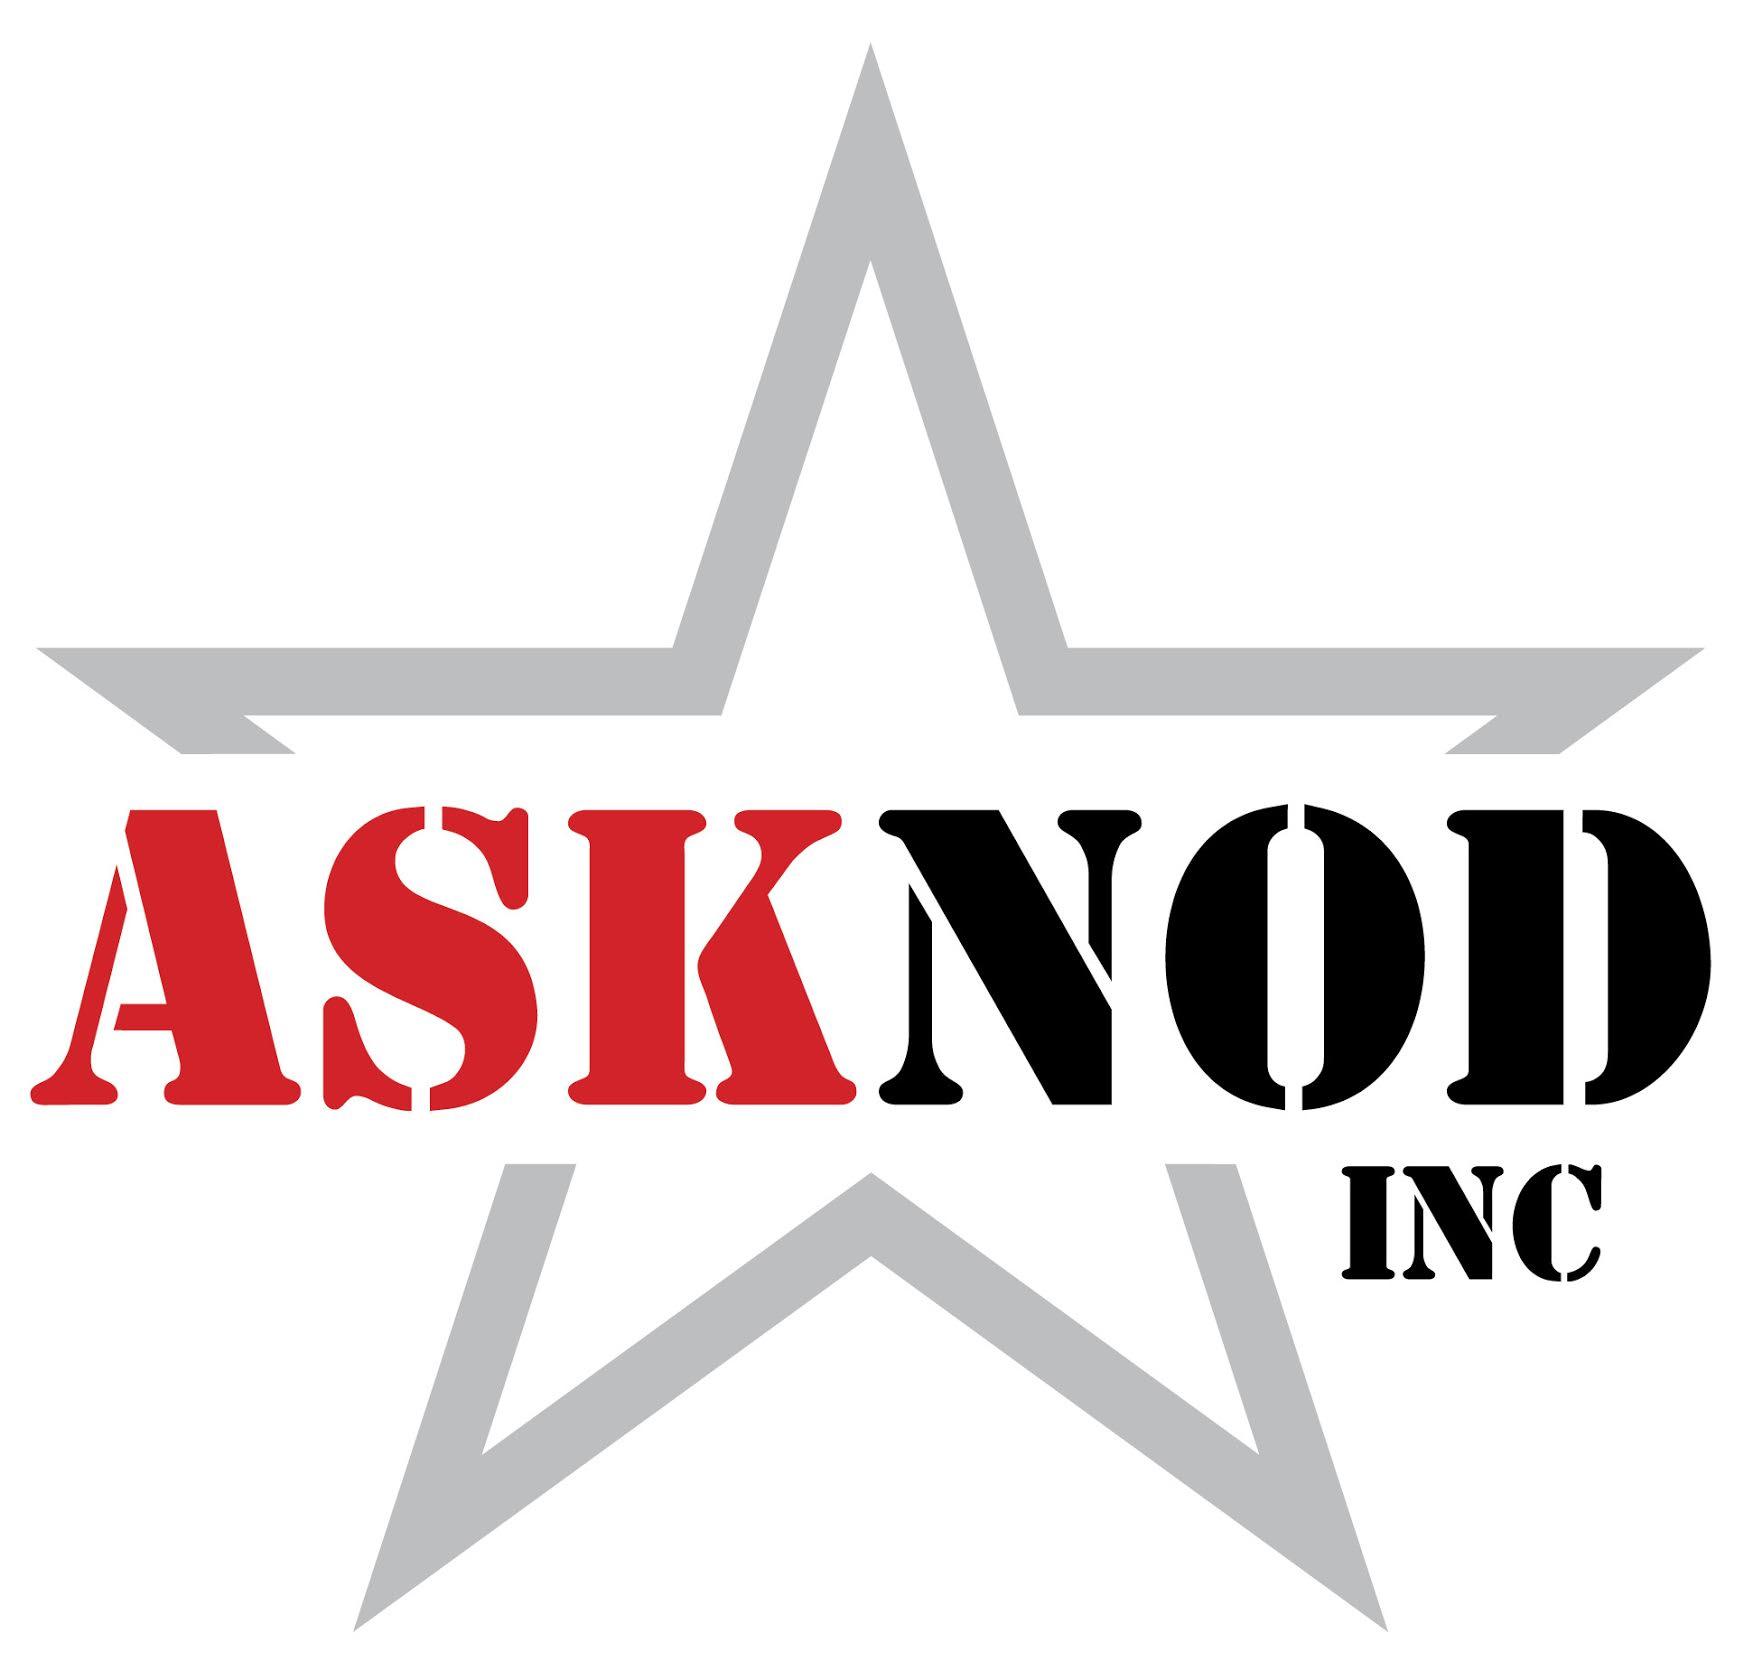 Nexus Imo Bible Asknod Veterans Claims Help